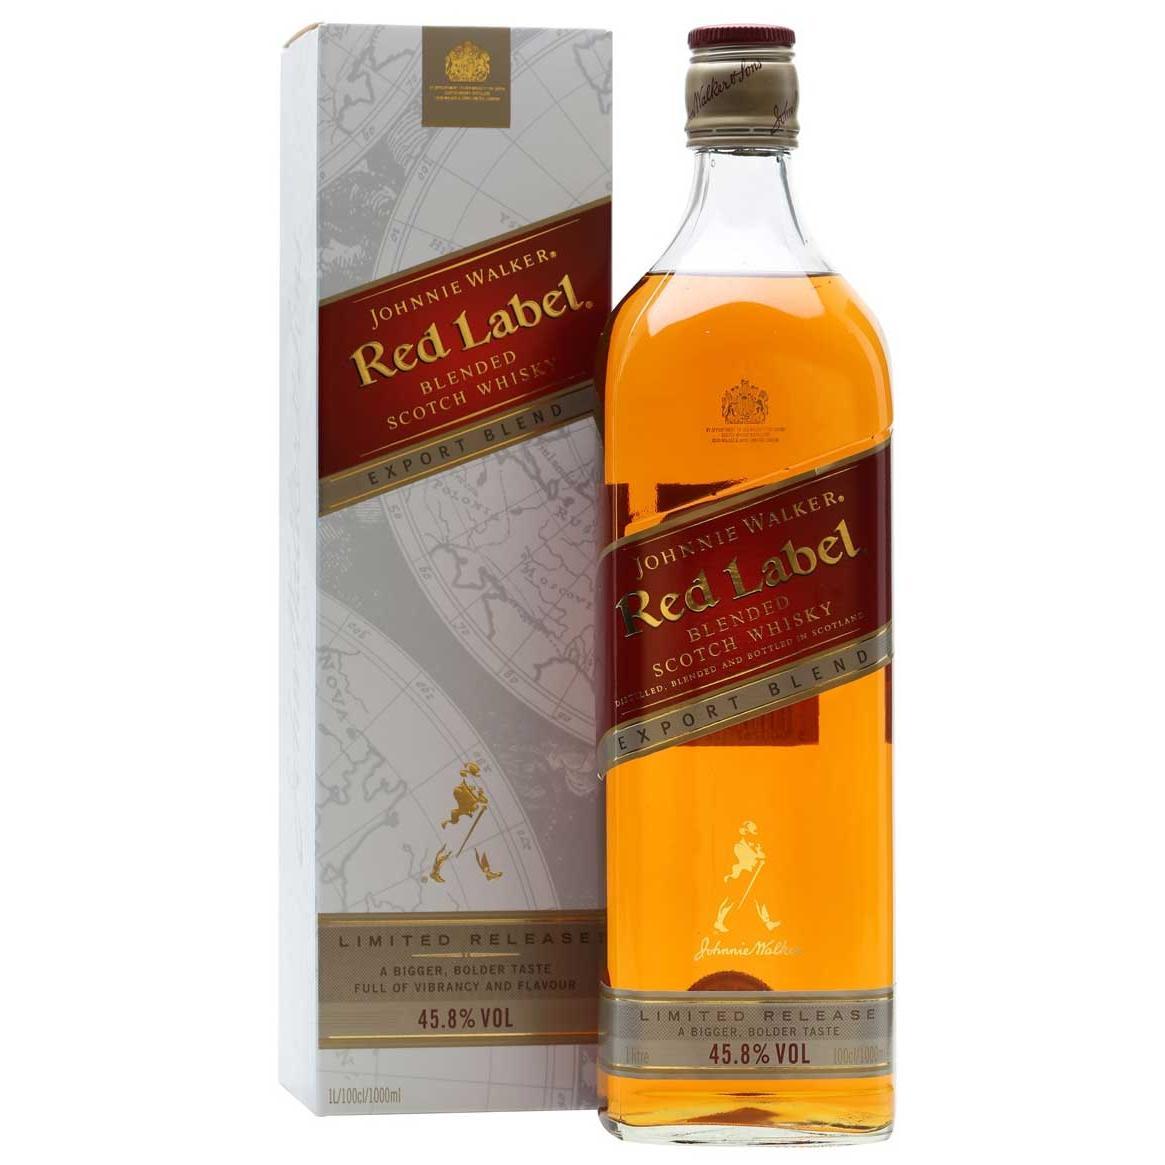 73fa58493d5 Johnnie Walker Red Label Export Blend 1 Liter - Buy Whisky - Scotch ...